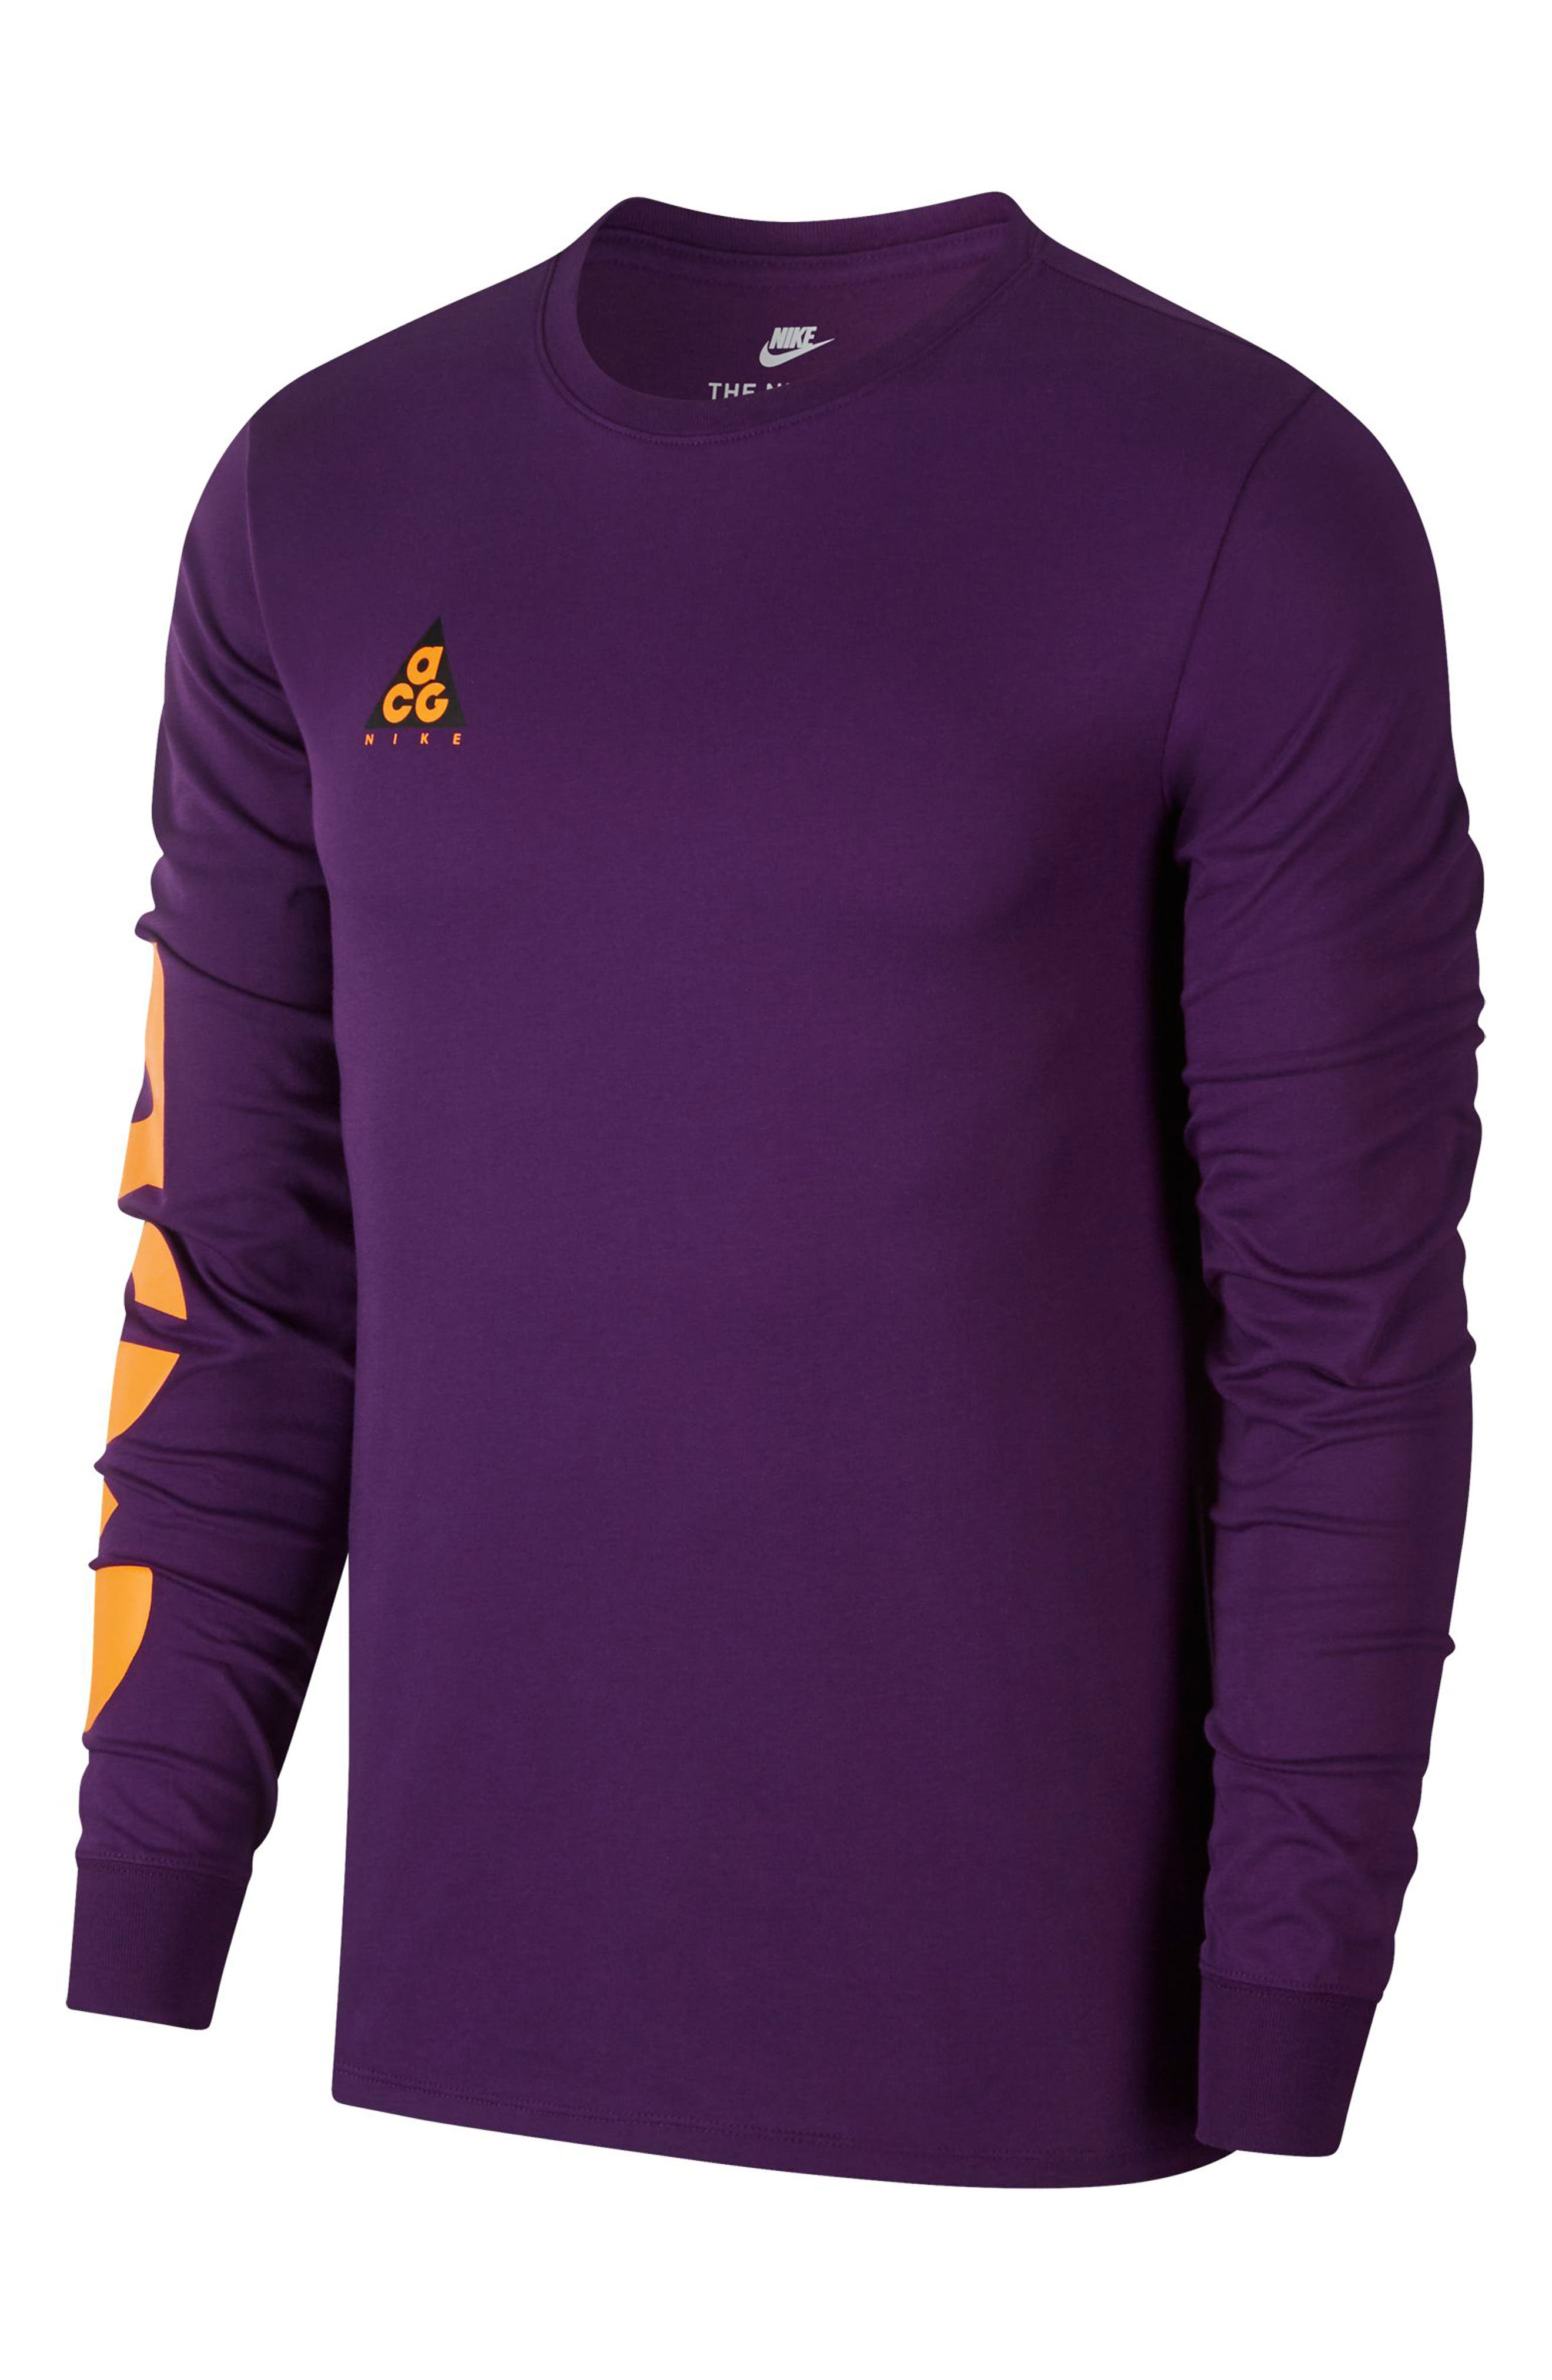 Nike Nsw Acg Graphic T-Shirt, Purple